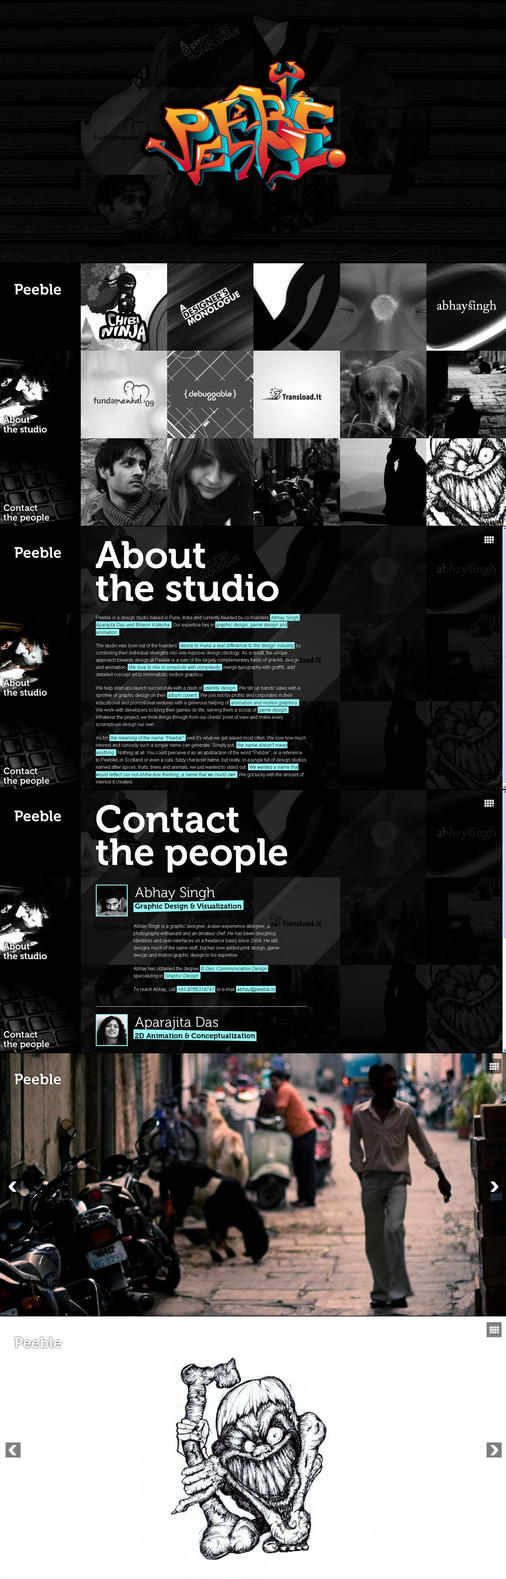 Peeble Website Design by AbhaySingh1